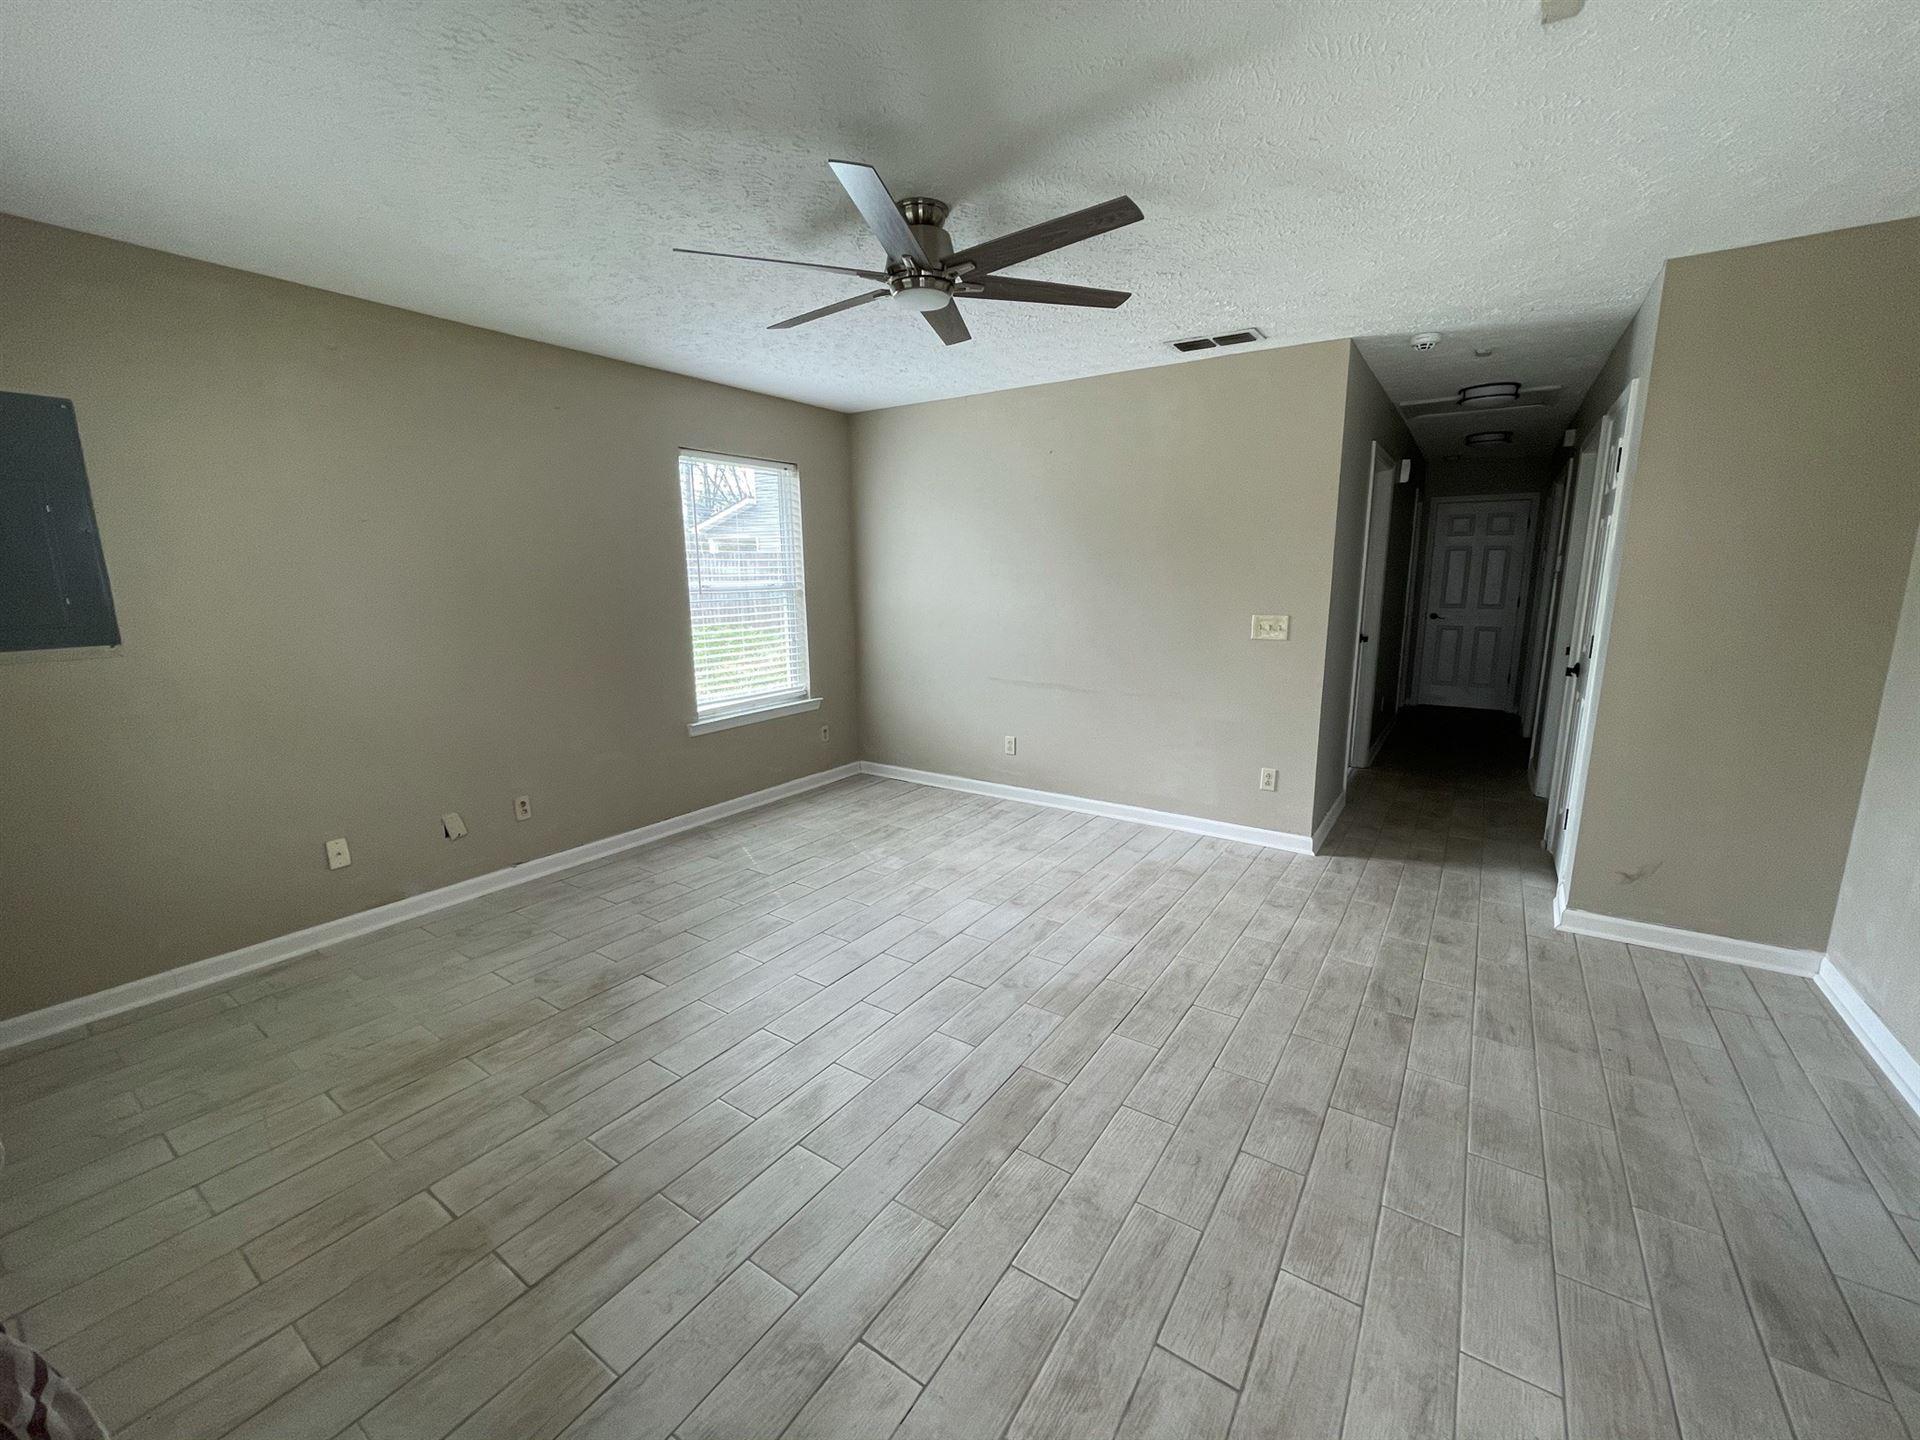 Photo of 546 E Sevier St, Murfreesboro, TN 37130 (MLS # 2242835)